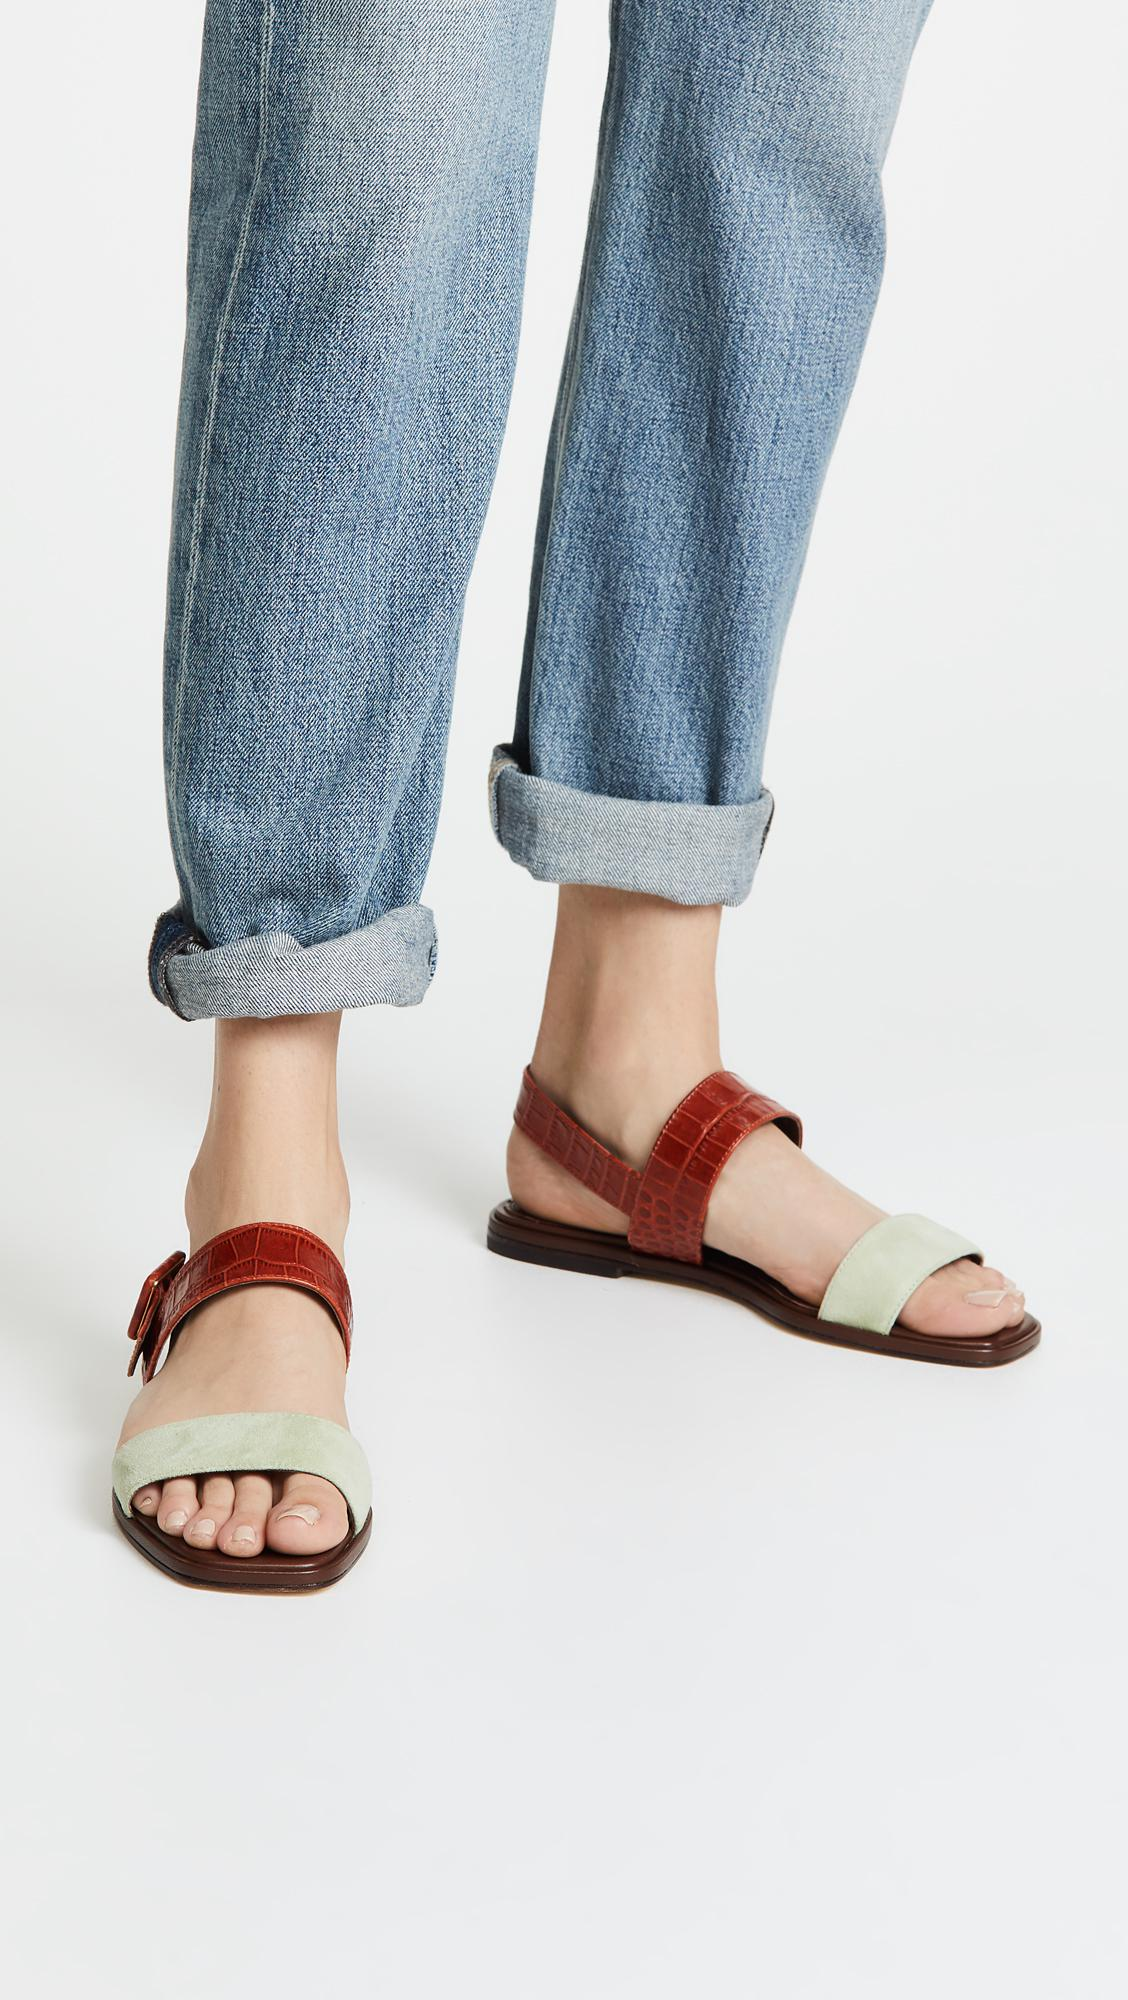 26672f6a3fbb Tory Burch - Multicolor Delaney Flat Sandals - Lyst. View fullscreen